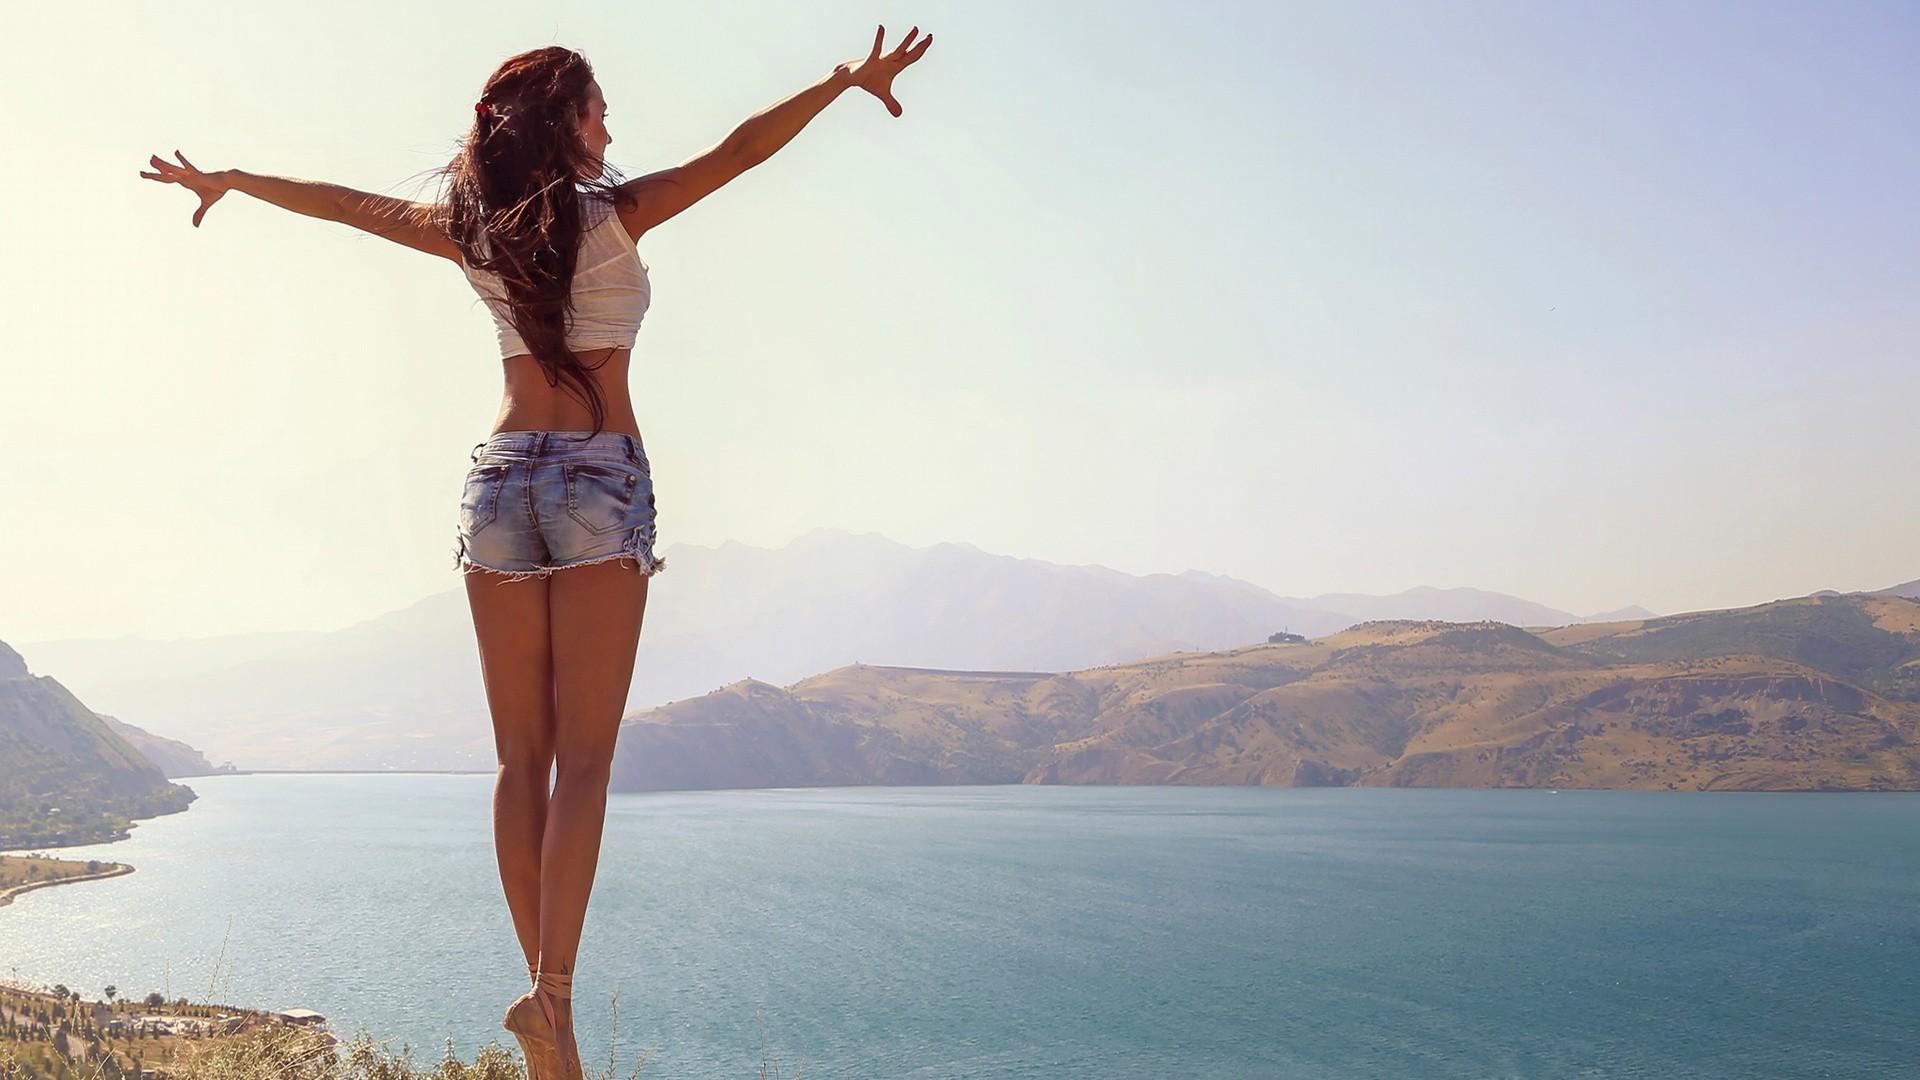 wallpaper : sunlight, women outdoors, model, sea, brunette, beach